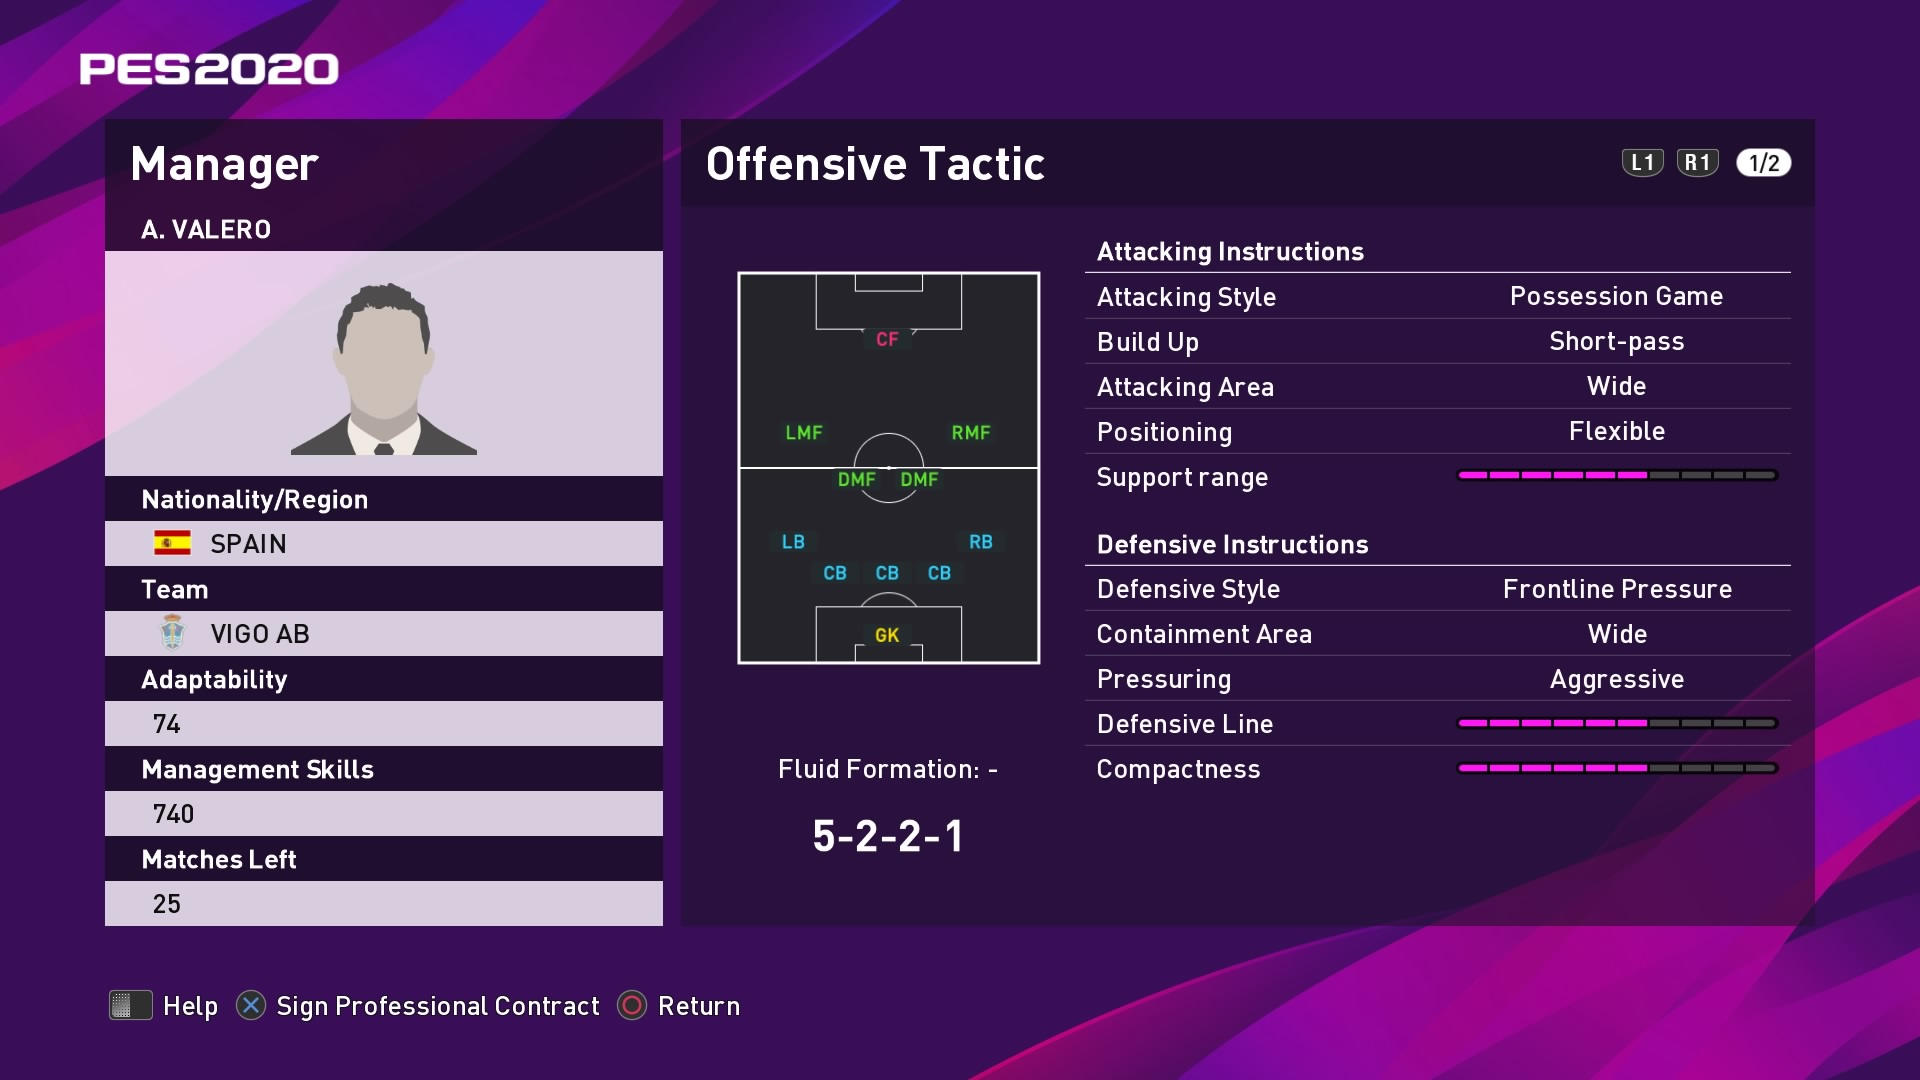 A. Valero (Óscar) Offensive Tactic in PES 2020 myClub